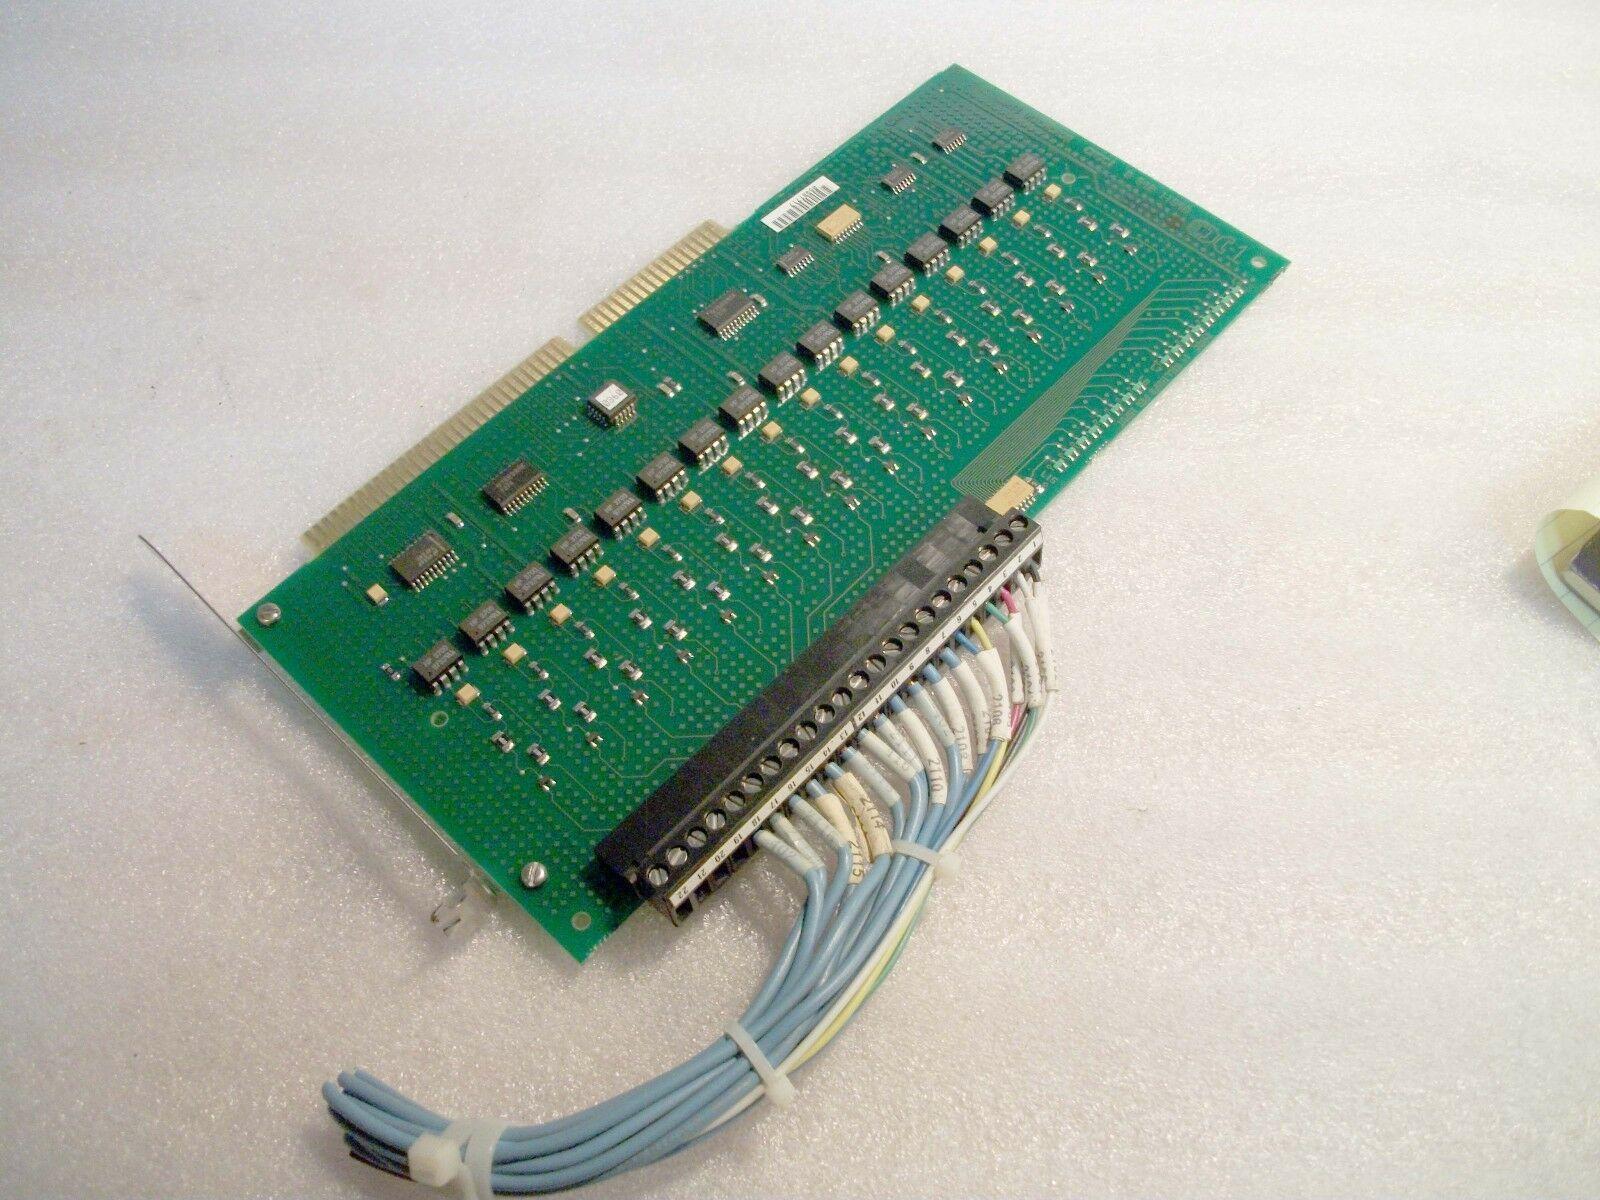 Cincinnati Milacron Siemens CNC Control Circuit Board CMDCO 3-542-1292A